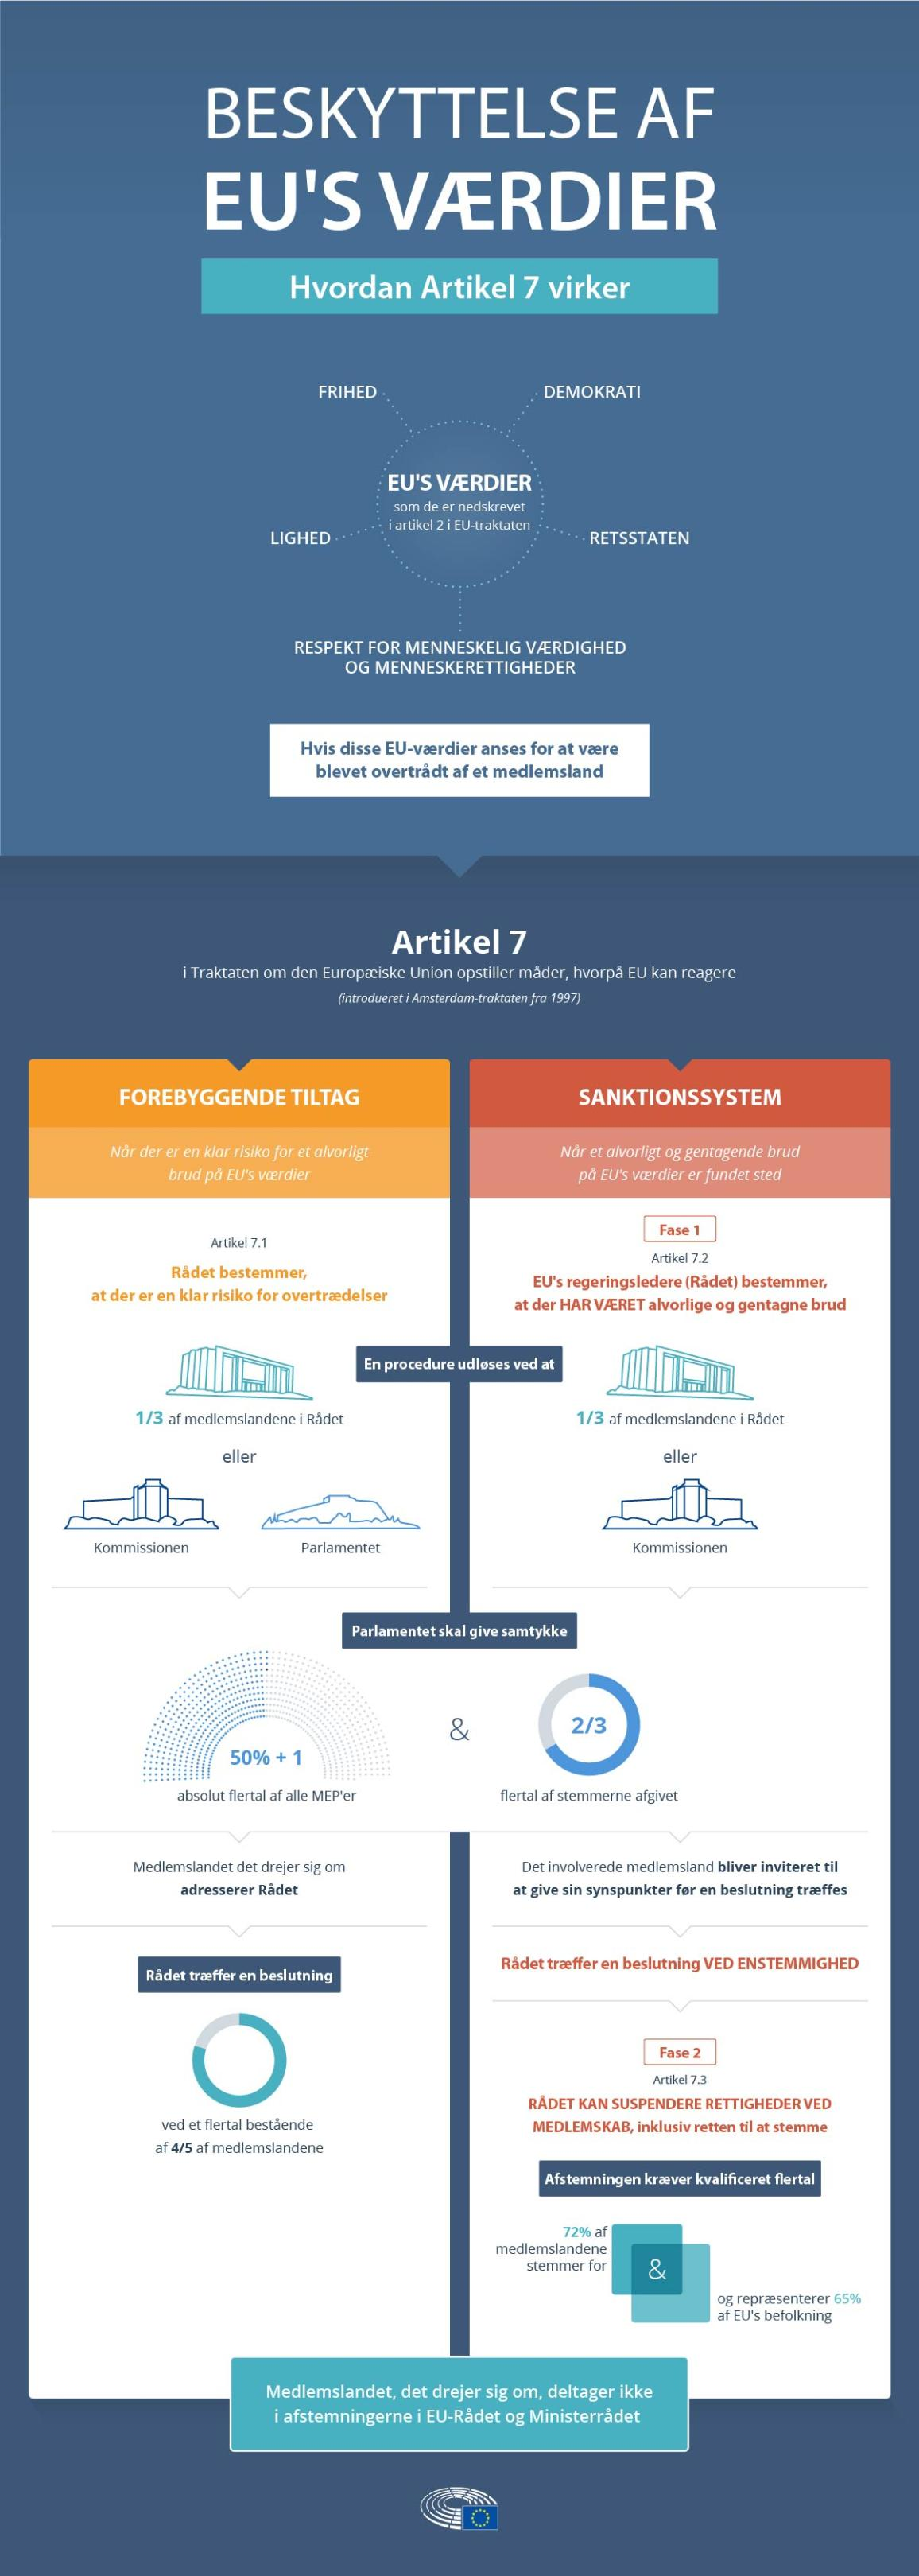 Infografik over Artikel 7